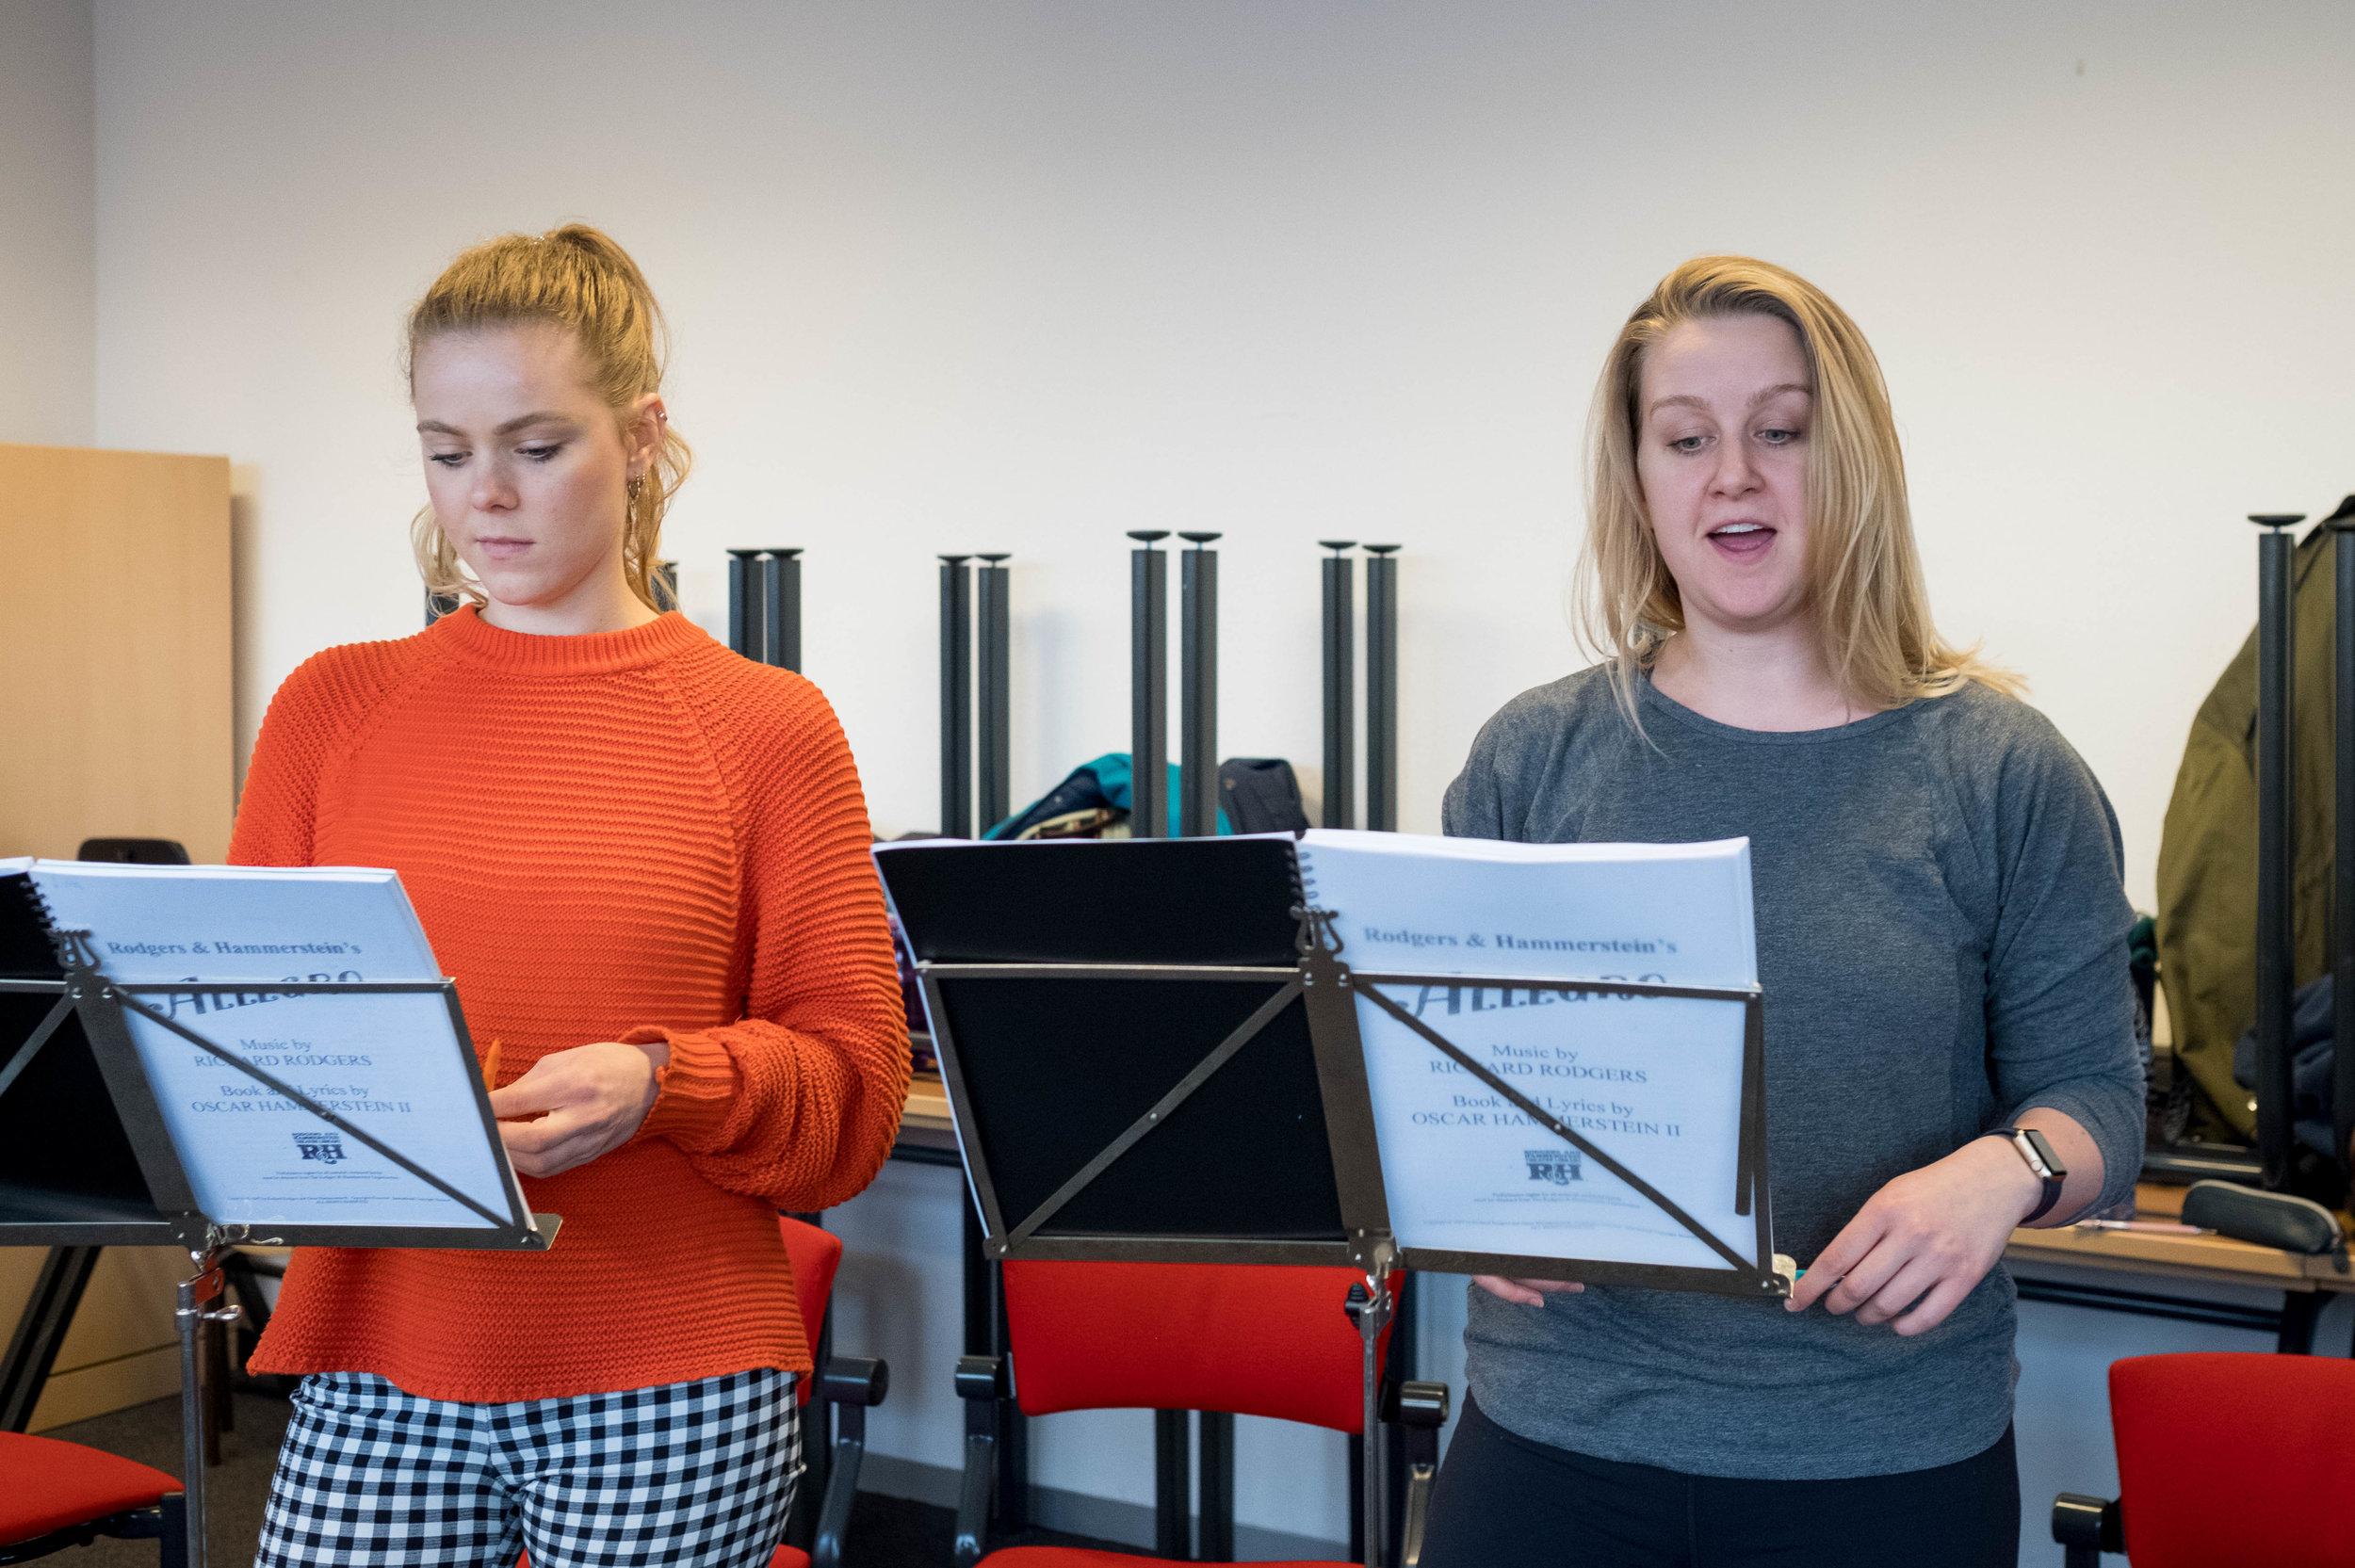 'Allegro' rehearsal image, courtesy of Jeroen Idema